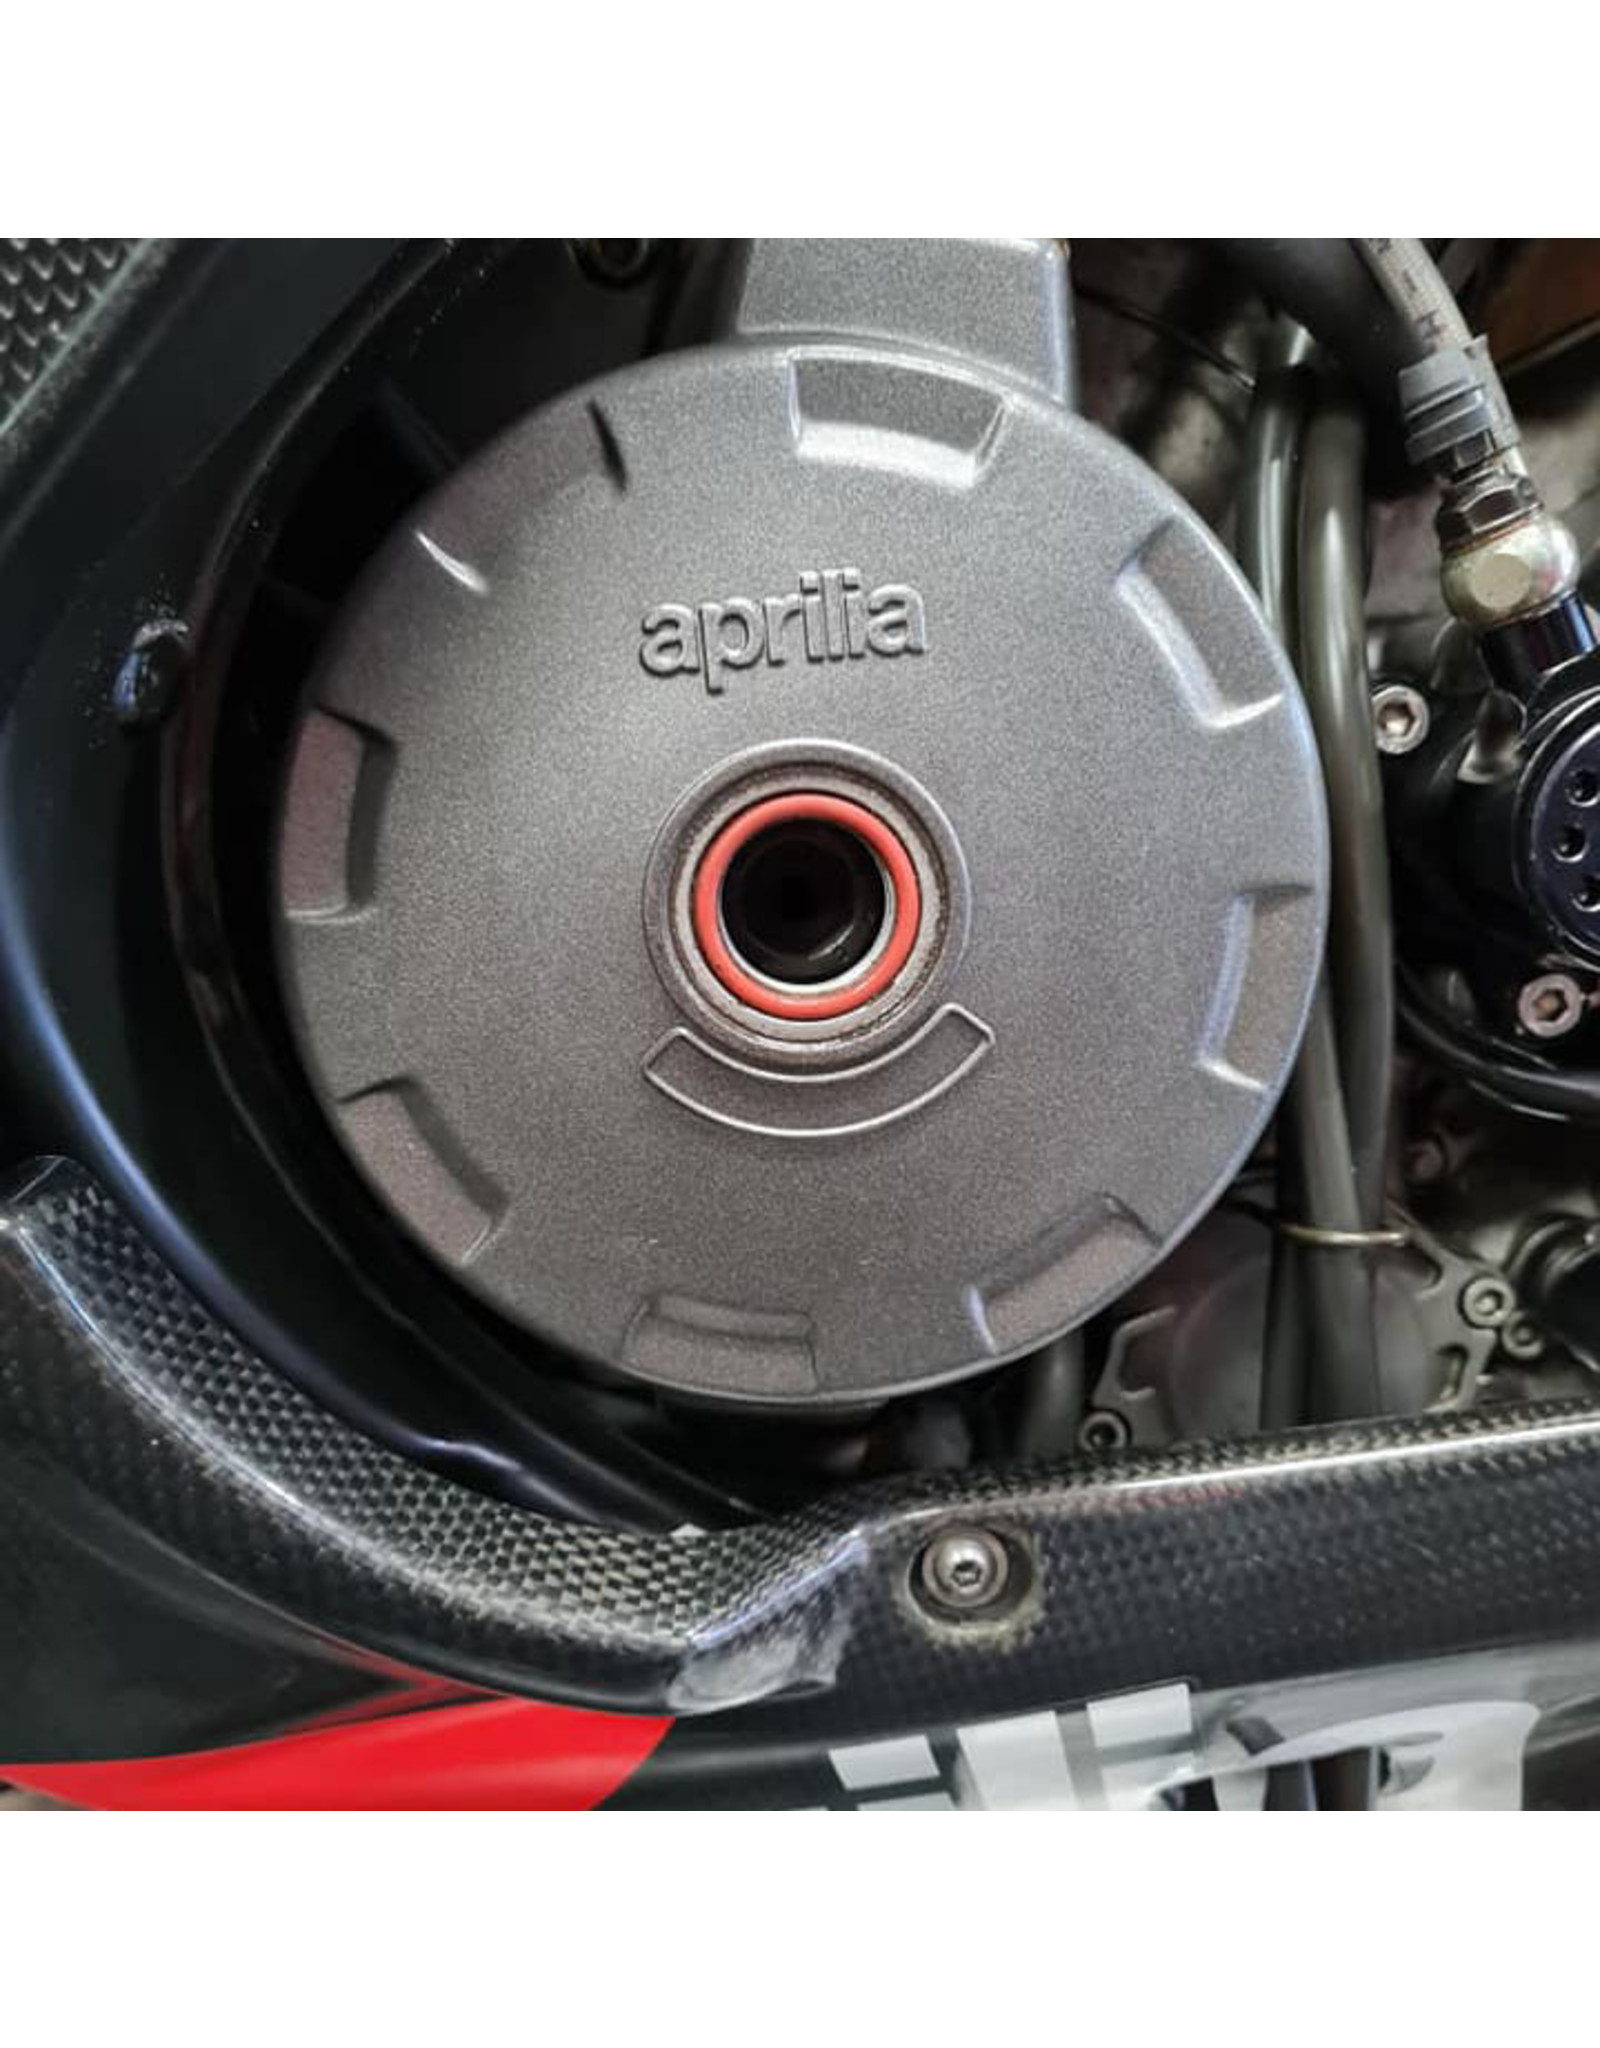 Aprilia Stator Case Plug 2R000528